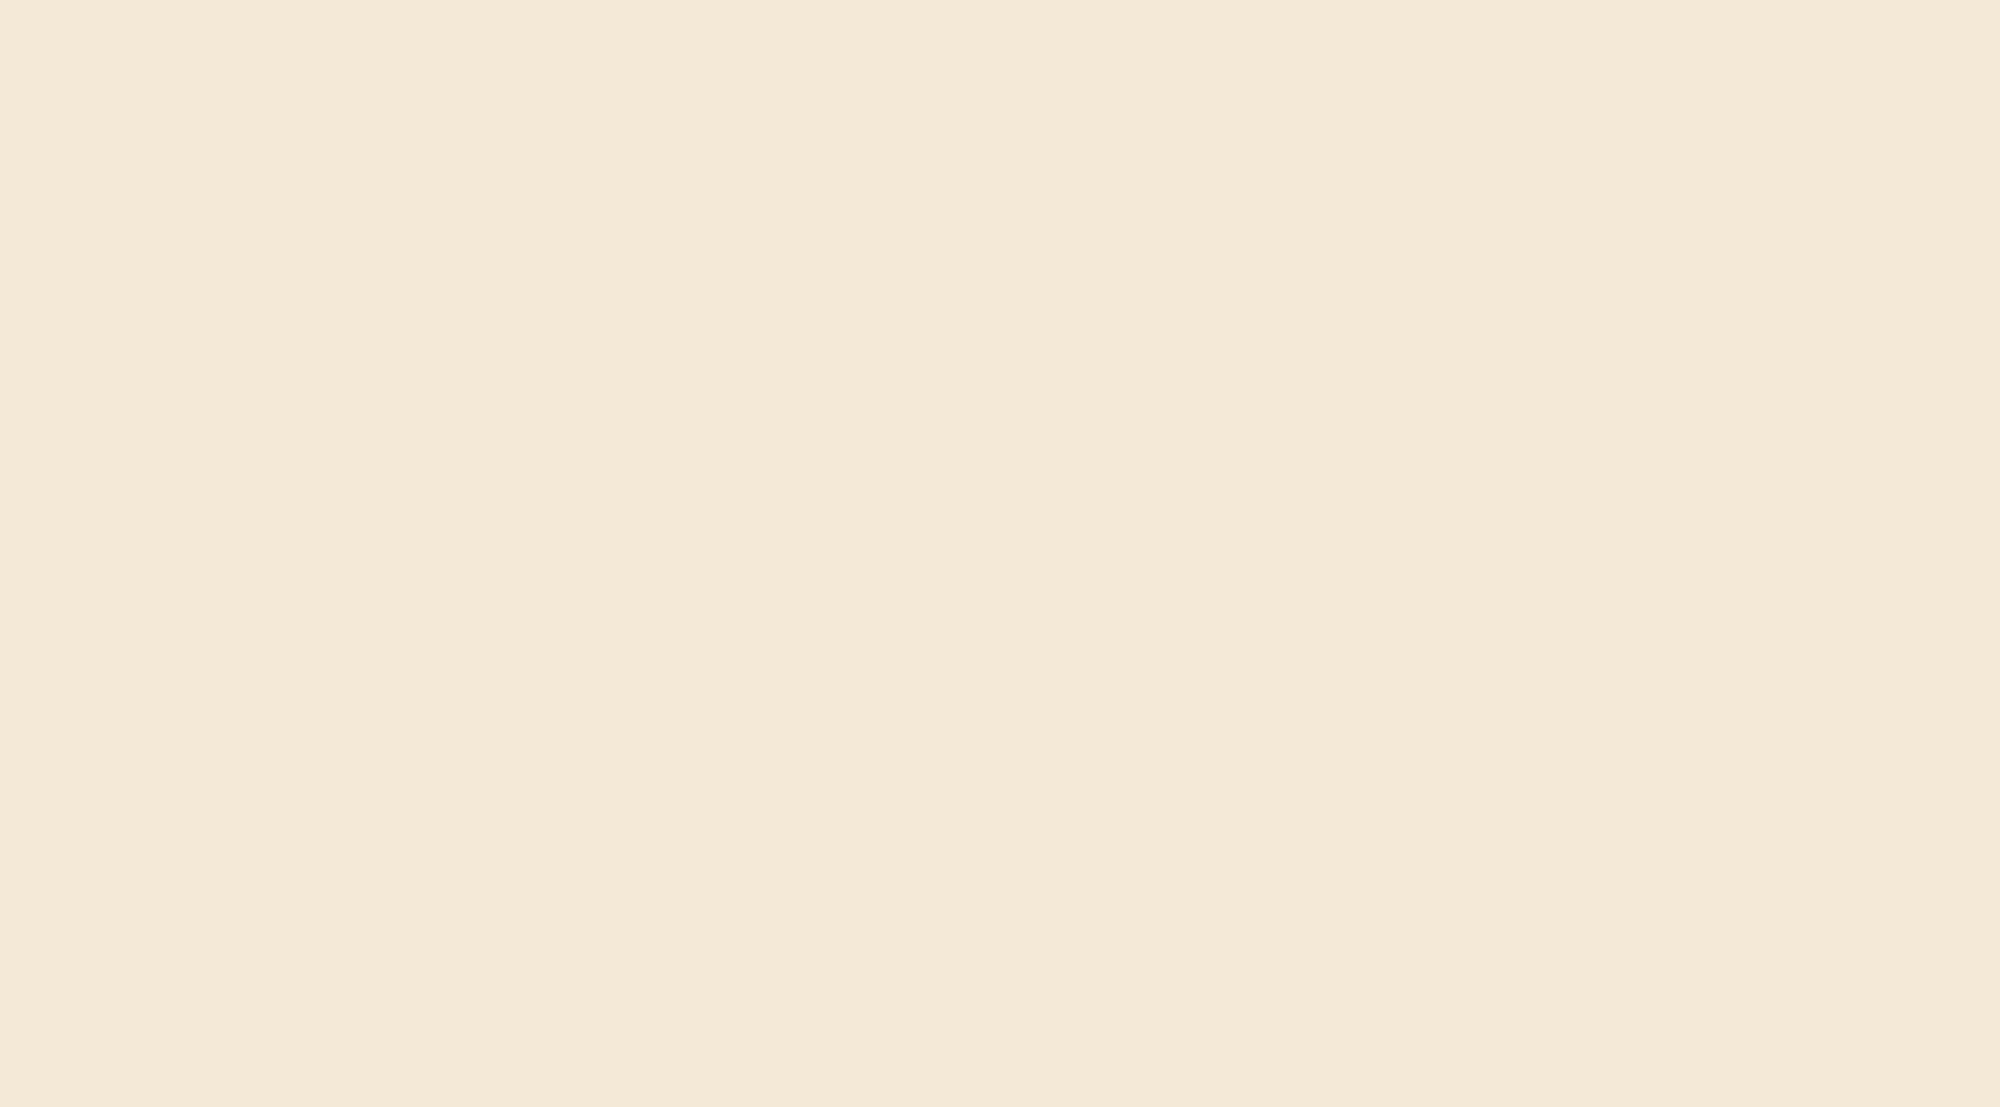 Revestimento Vivence 160096 Bege 31X56cm Acetinado